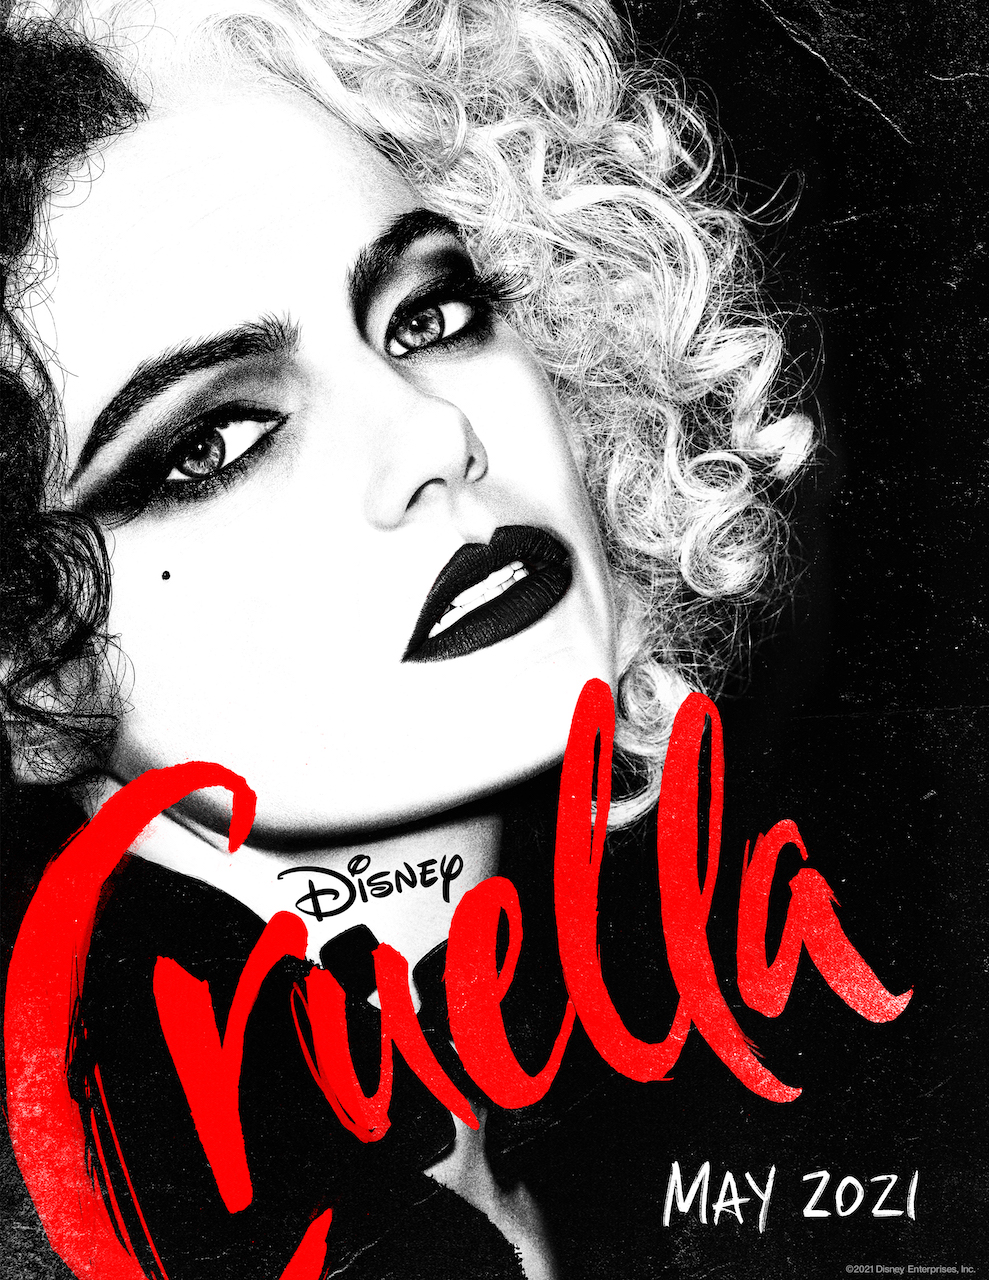 H Cruella μόλις επέκτησε τη δική της M·A·C collection και δηλώνουμε ερωτευμέvες